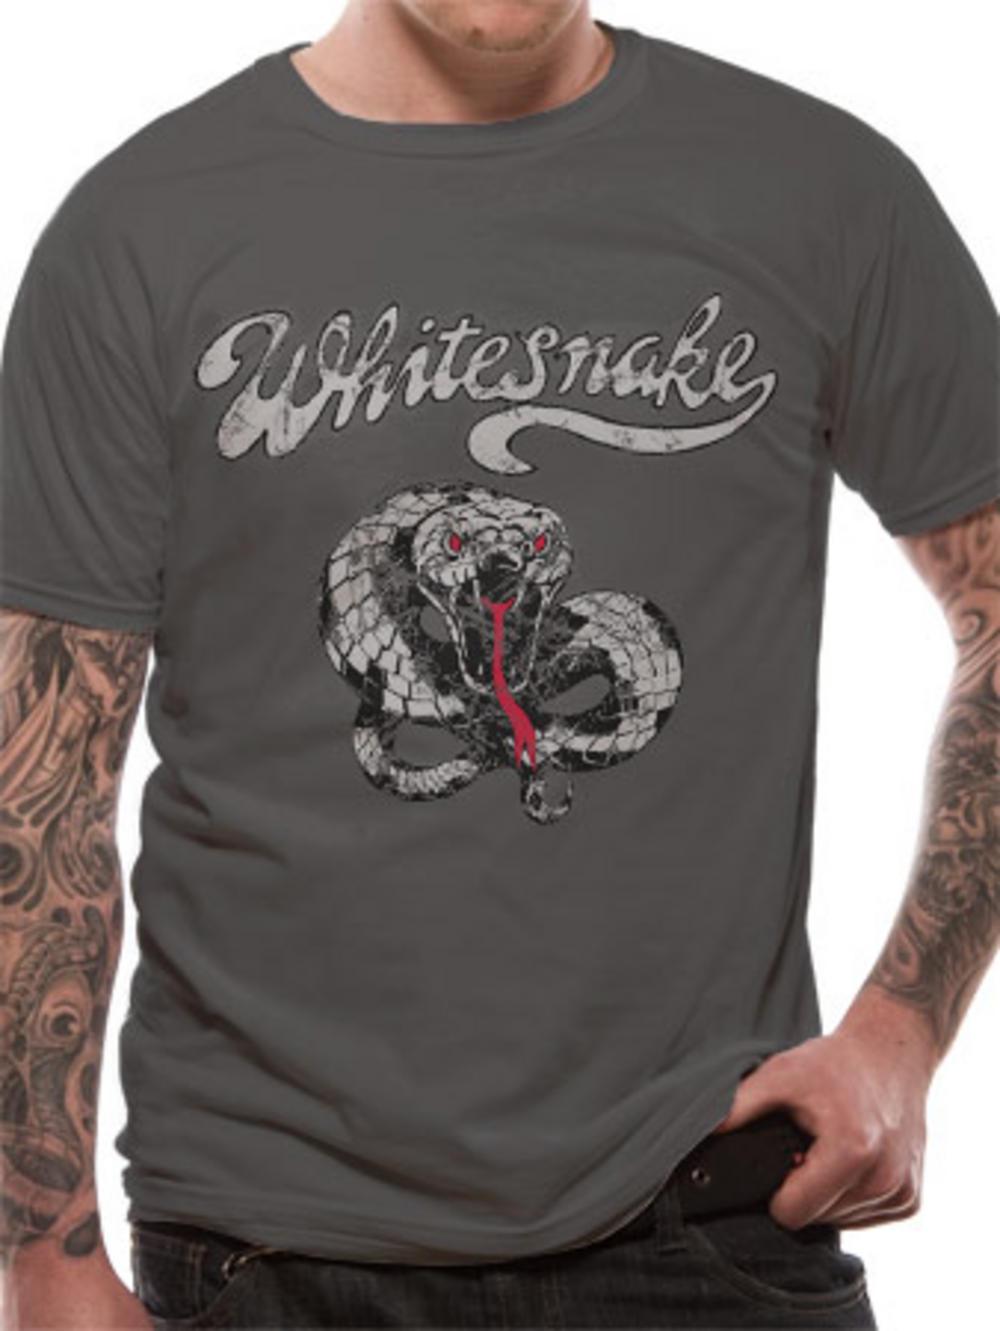 Whitesnake (Make Some Noise) T-shirt Pre-order Release W/C 27th April